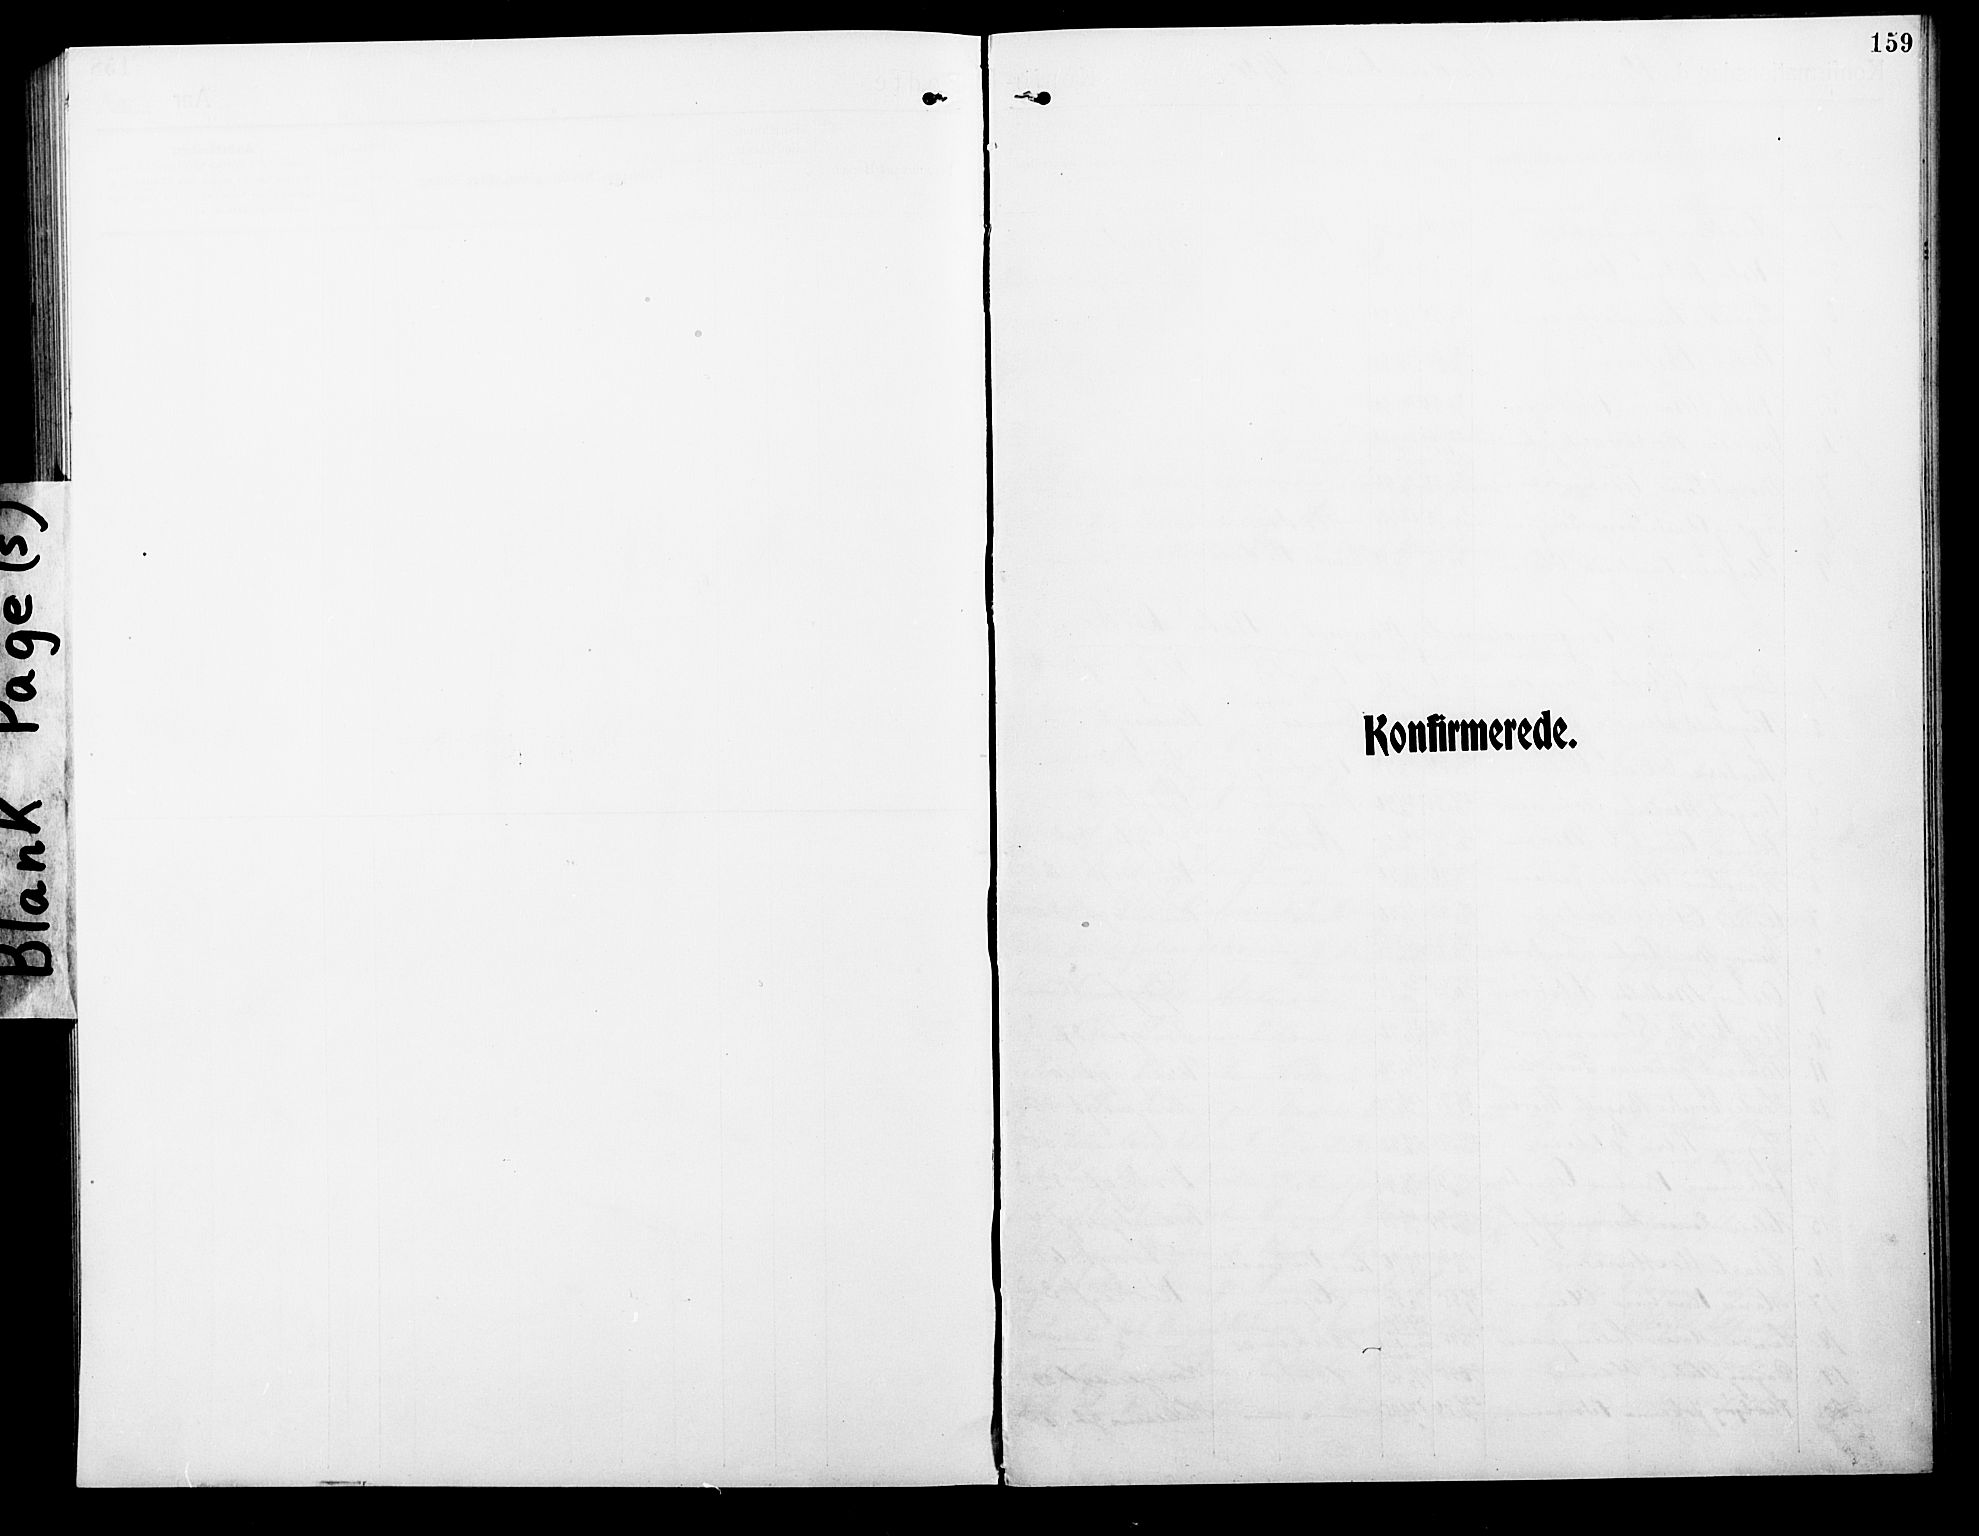 SAT, Ministerialprotokoller, klokkerbøker og fødselsregistre - Nordland, 801/L0034: Klokkerbok nr. 801C09, 1910-1922, s. 159